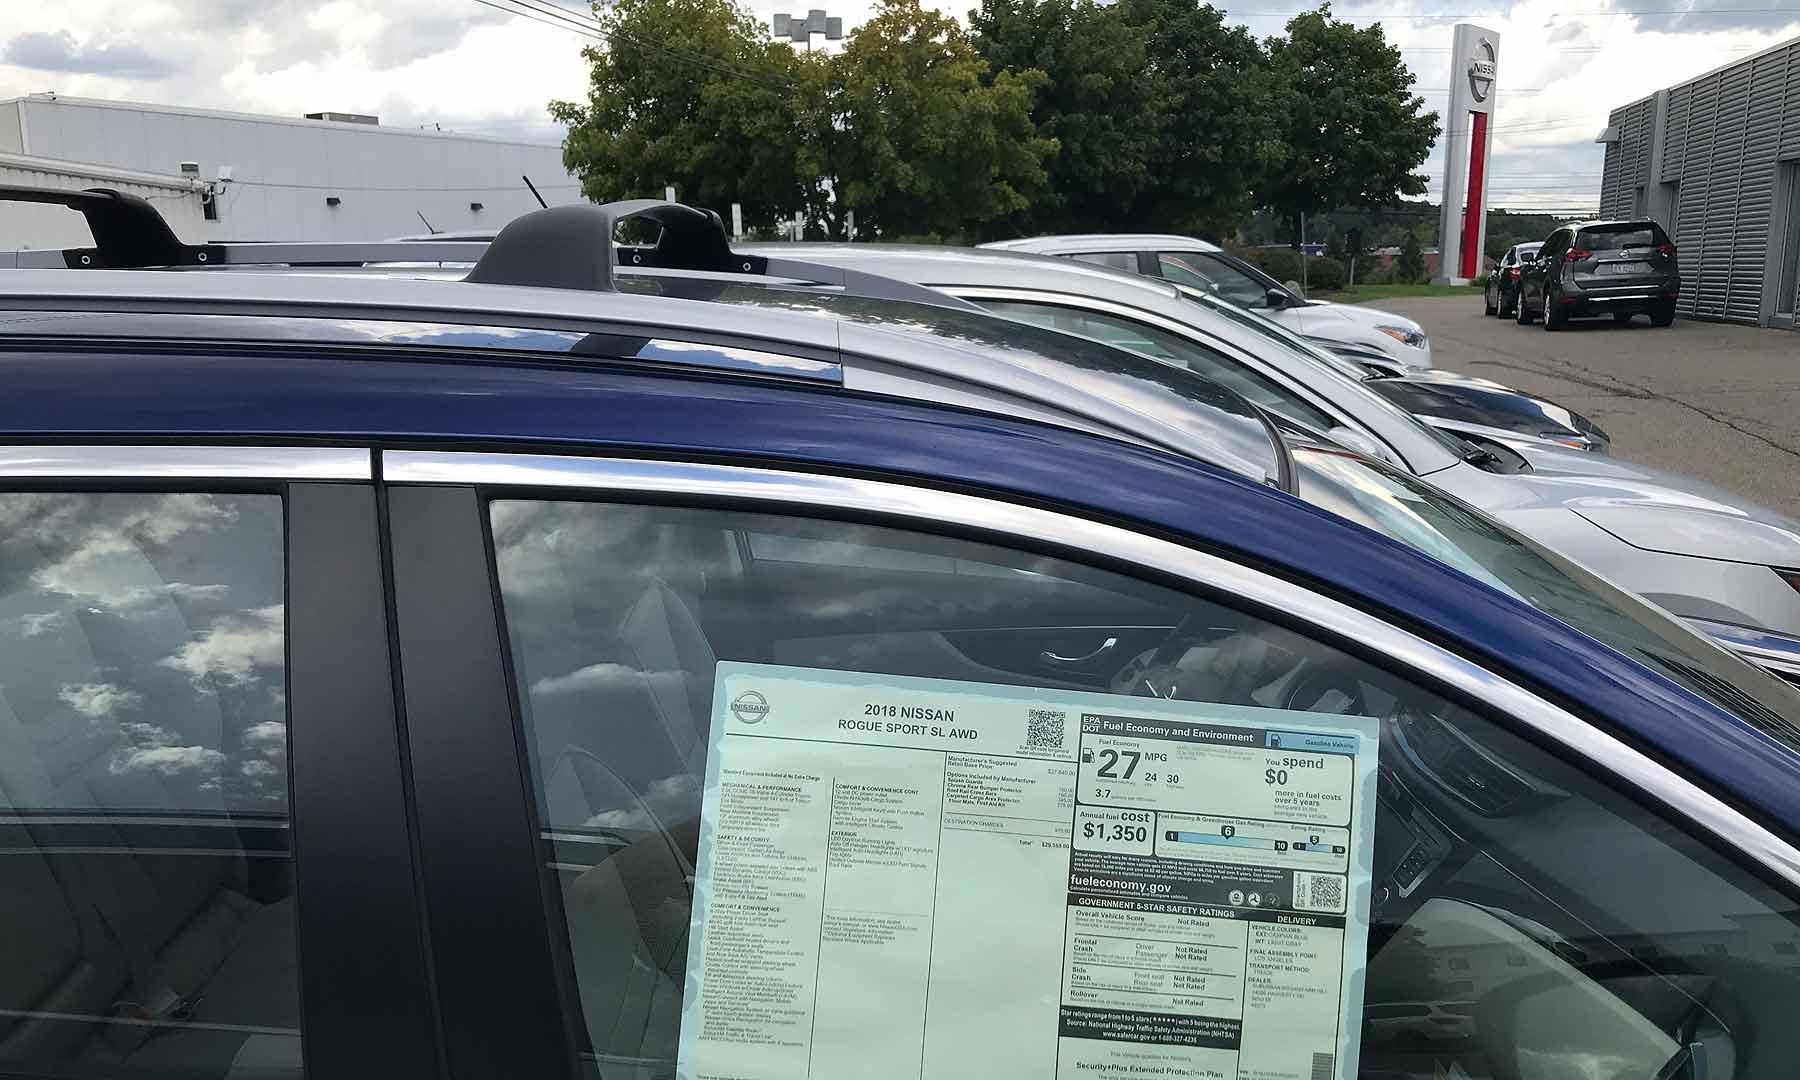 u.s. october 2018 nissan auto sales: sales slide 11% despite